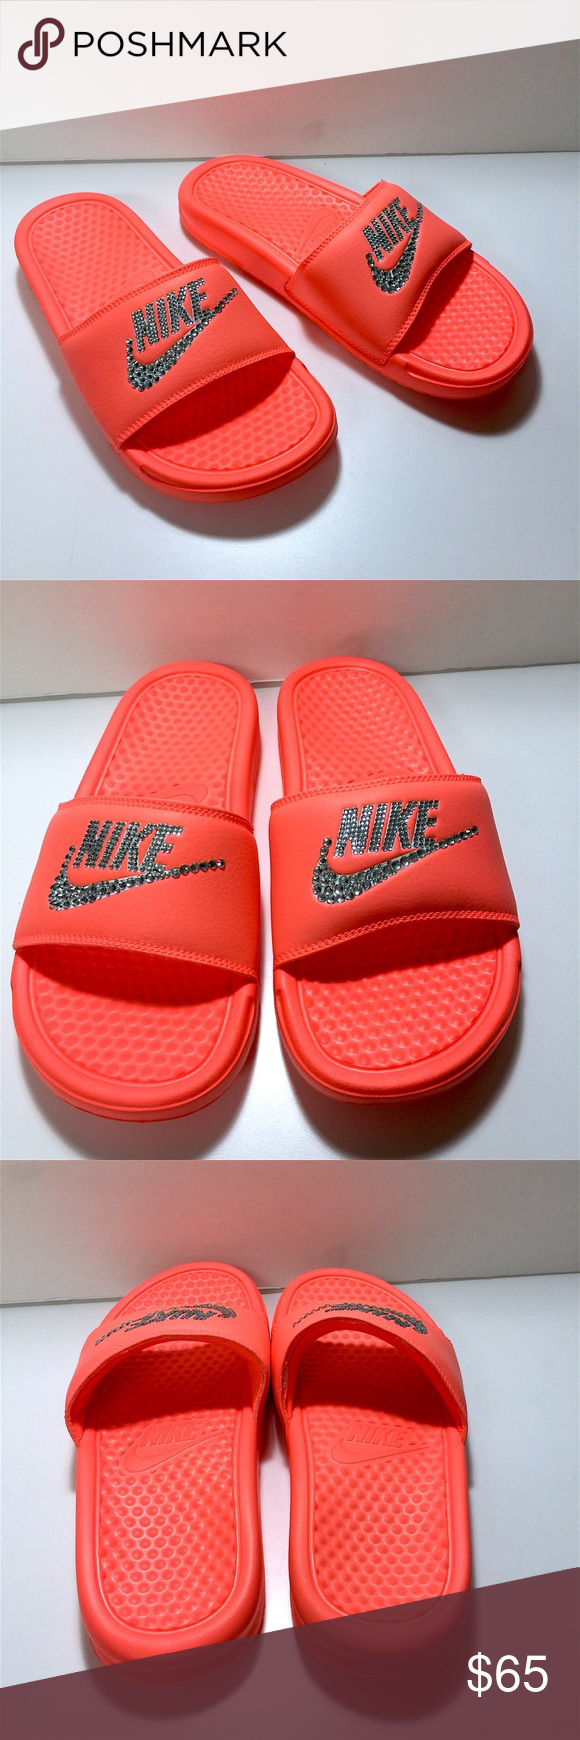 e141c8d330f9 Custom Blinged Mango Color Nike Benassi Slides Mango color CUSTOM MADE Nike  slides